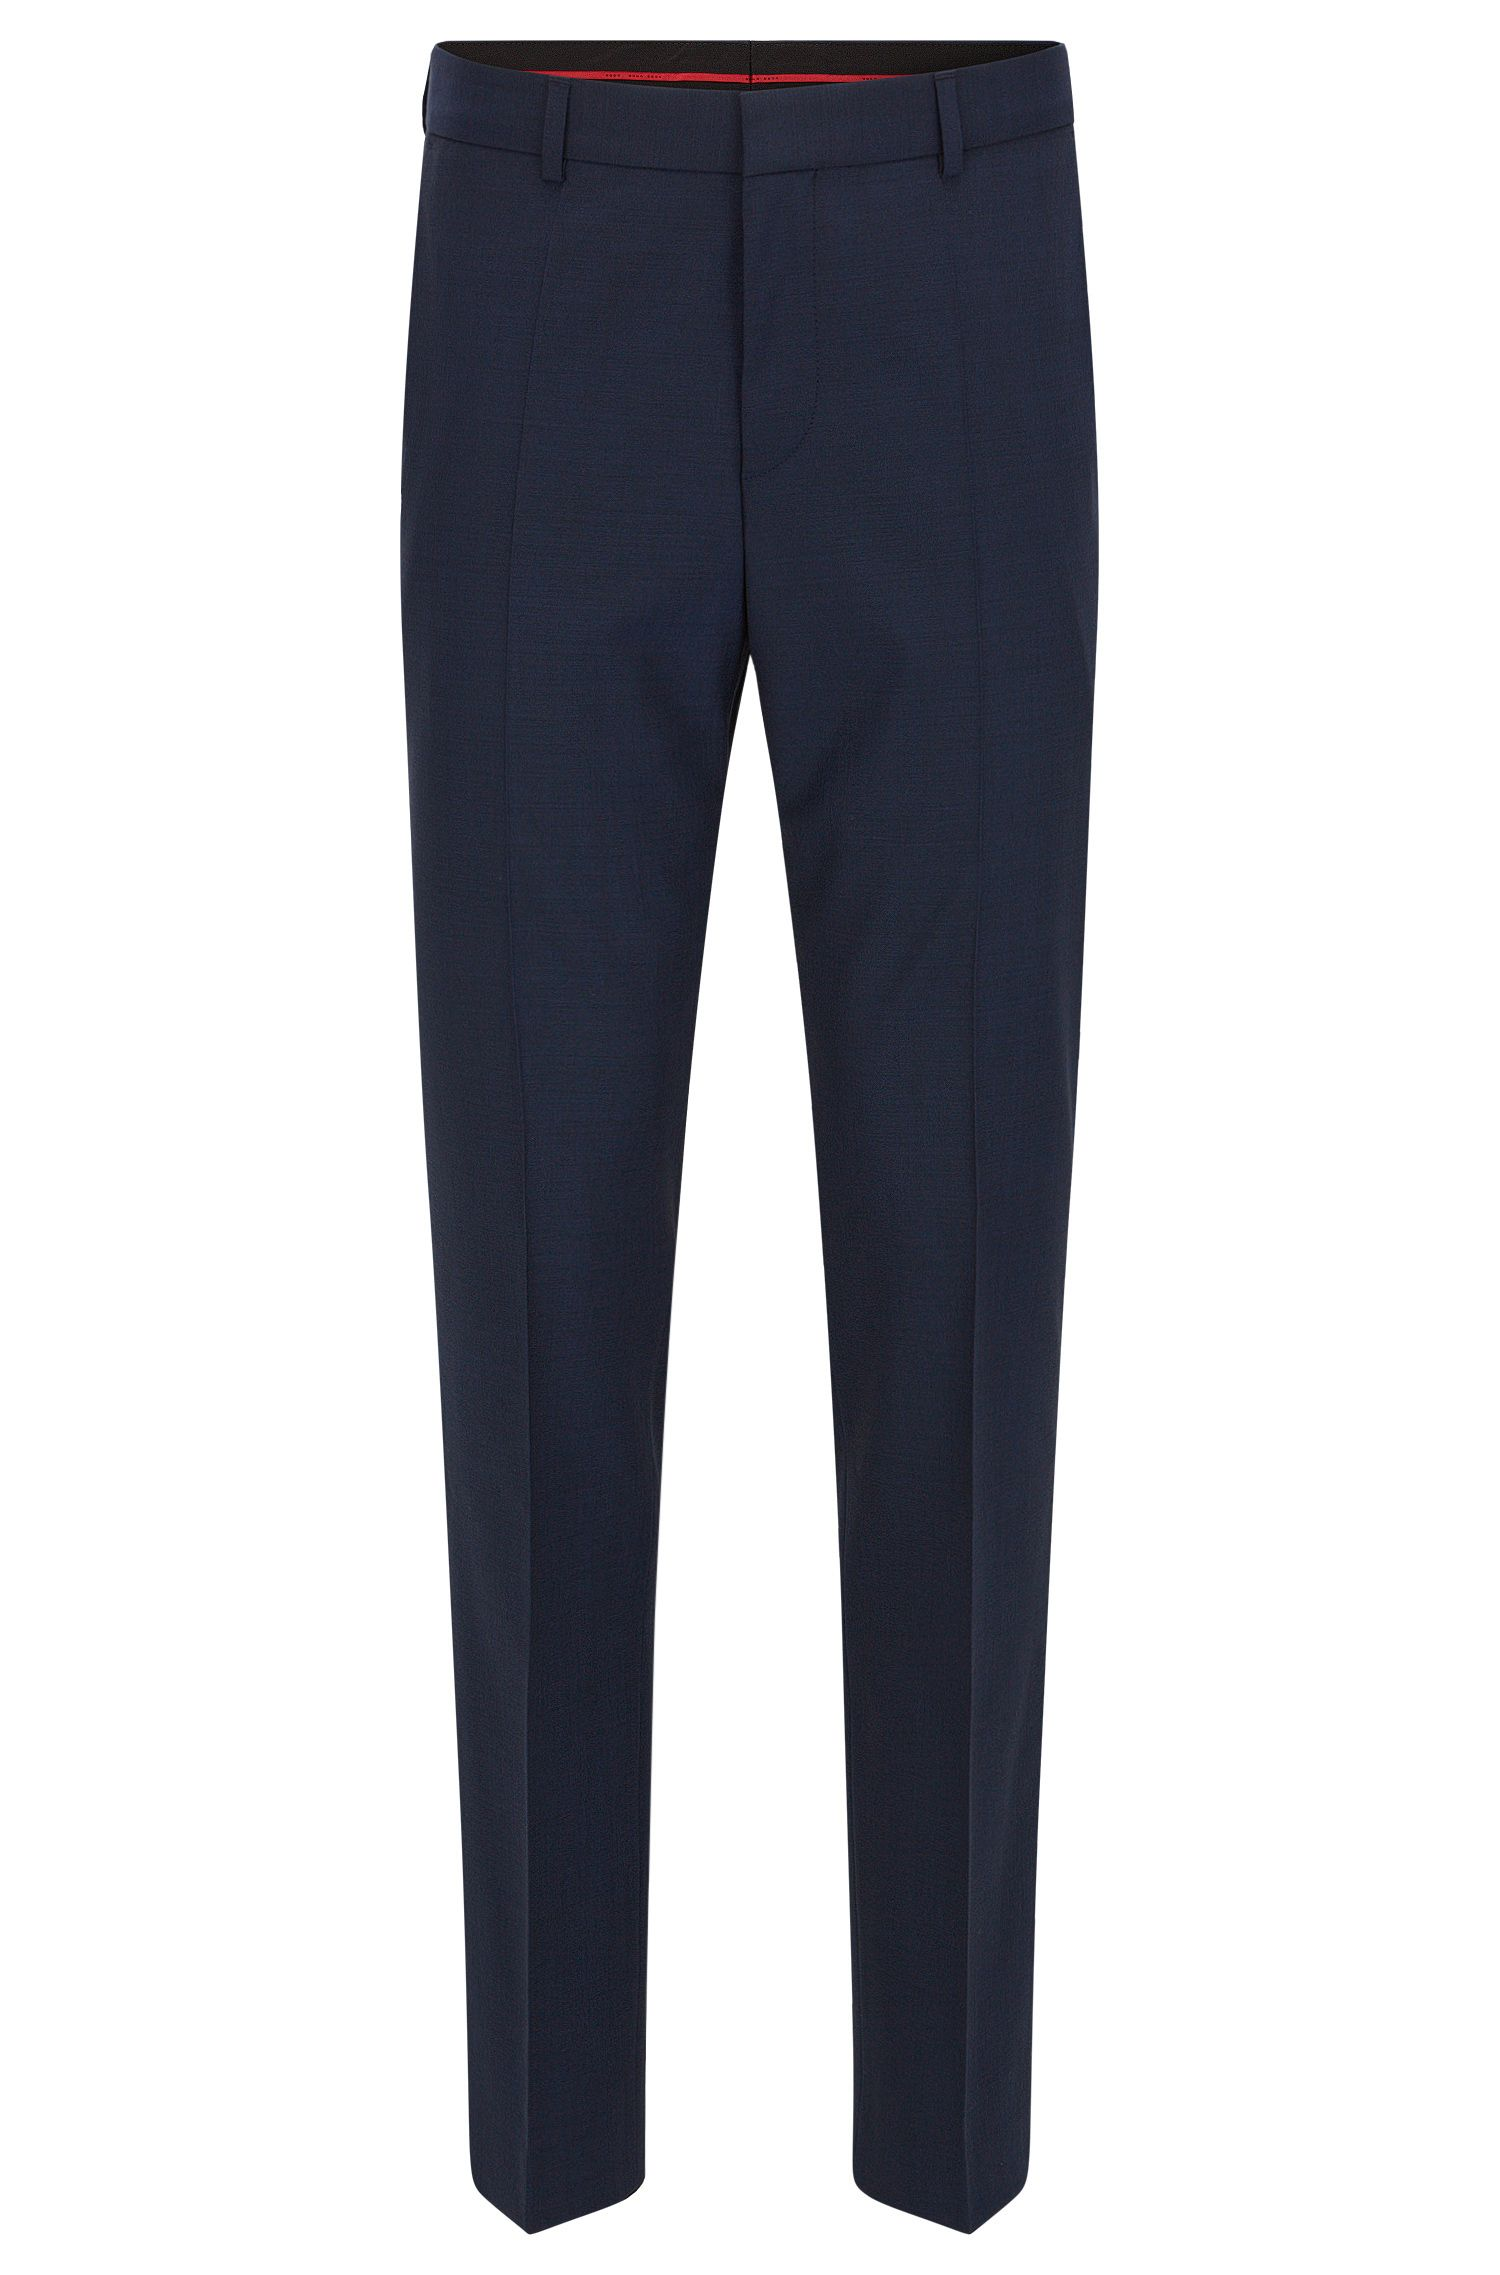 Pantaloni con gamba slim in misto lana